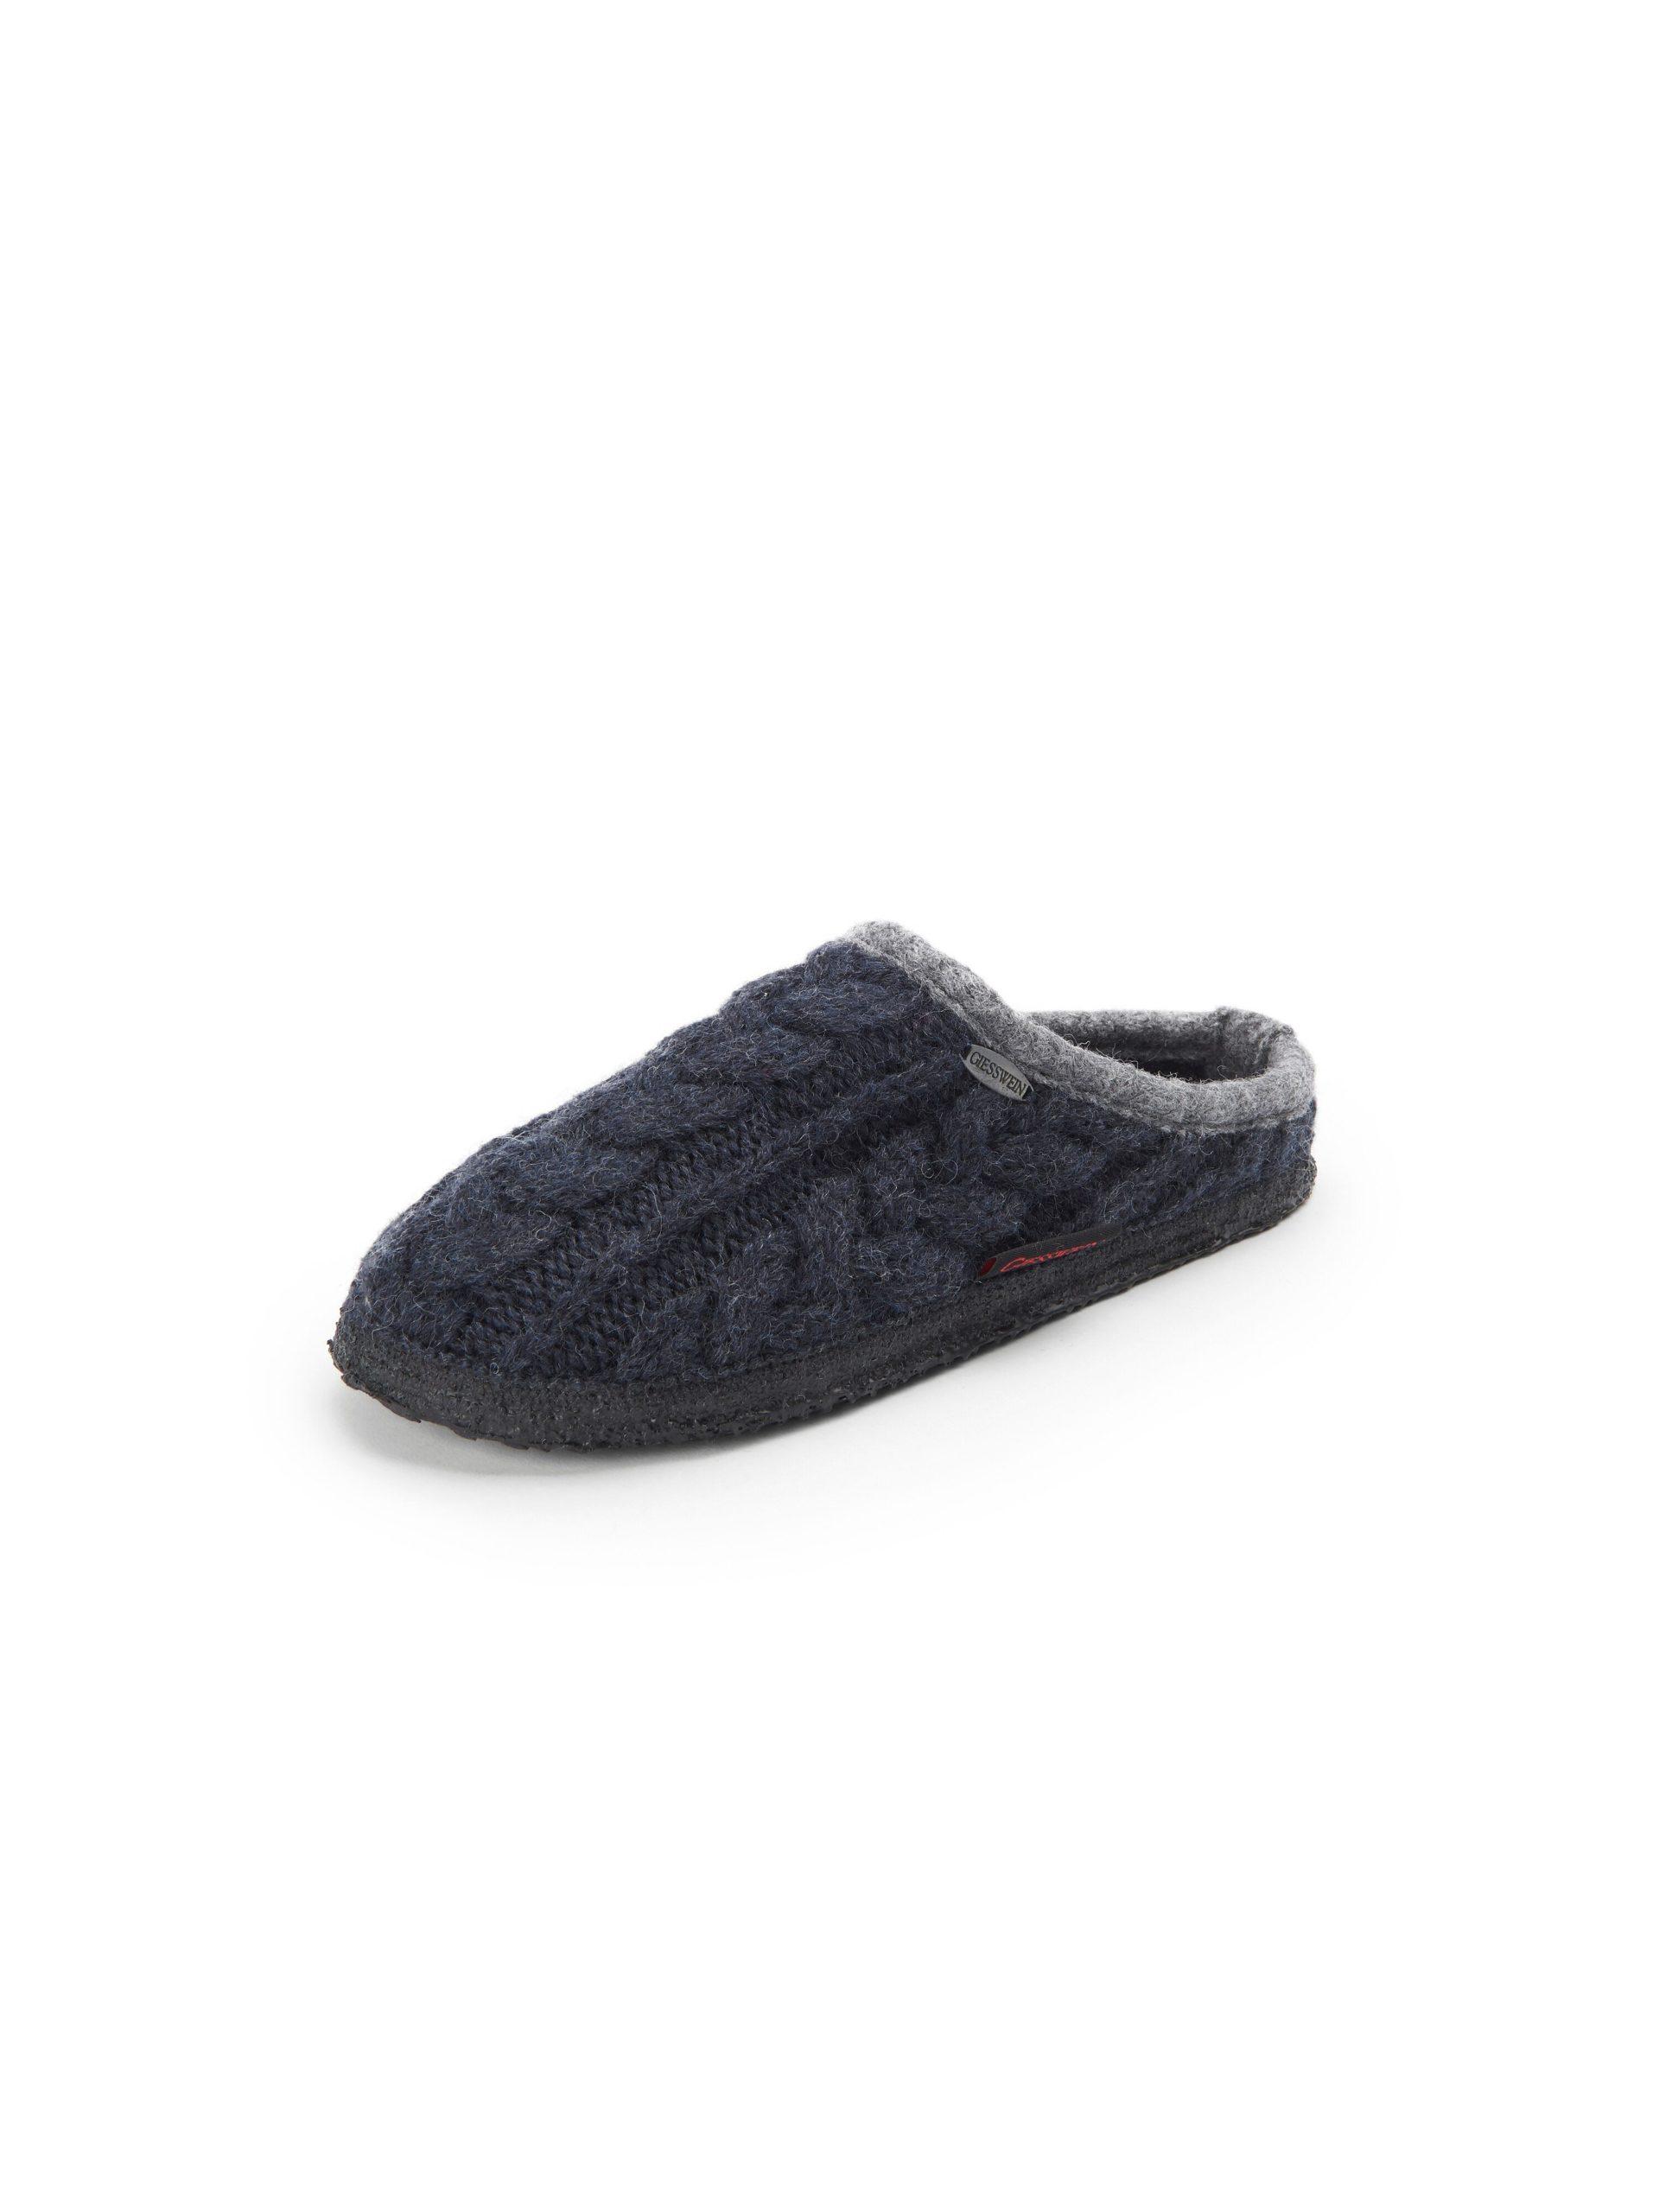 Pantoffels Van Giesswein blauw Kopen